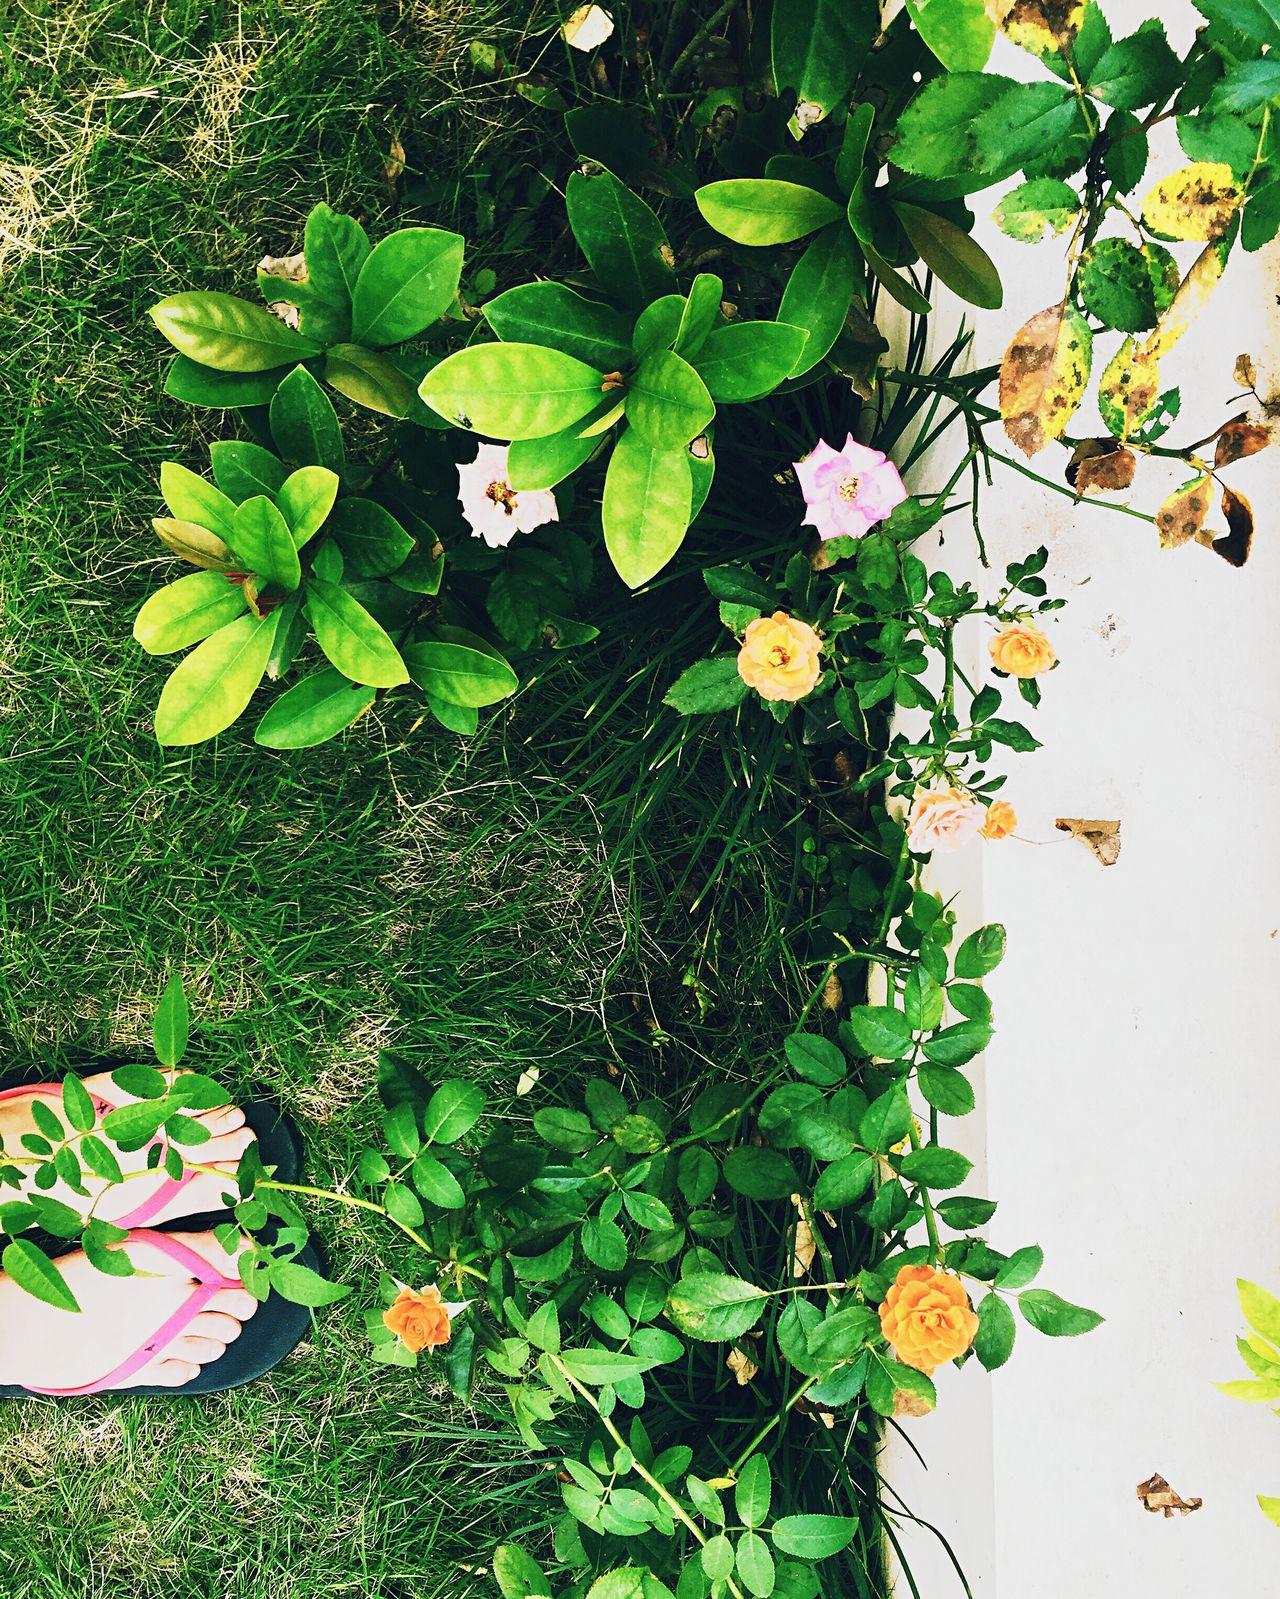 Mybeautifulholiday Tinyflowers Grassland Sofreshsocool Myfootwearstories The magic of my summer ⛅️🌿🌼 First Eyeem Photo